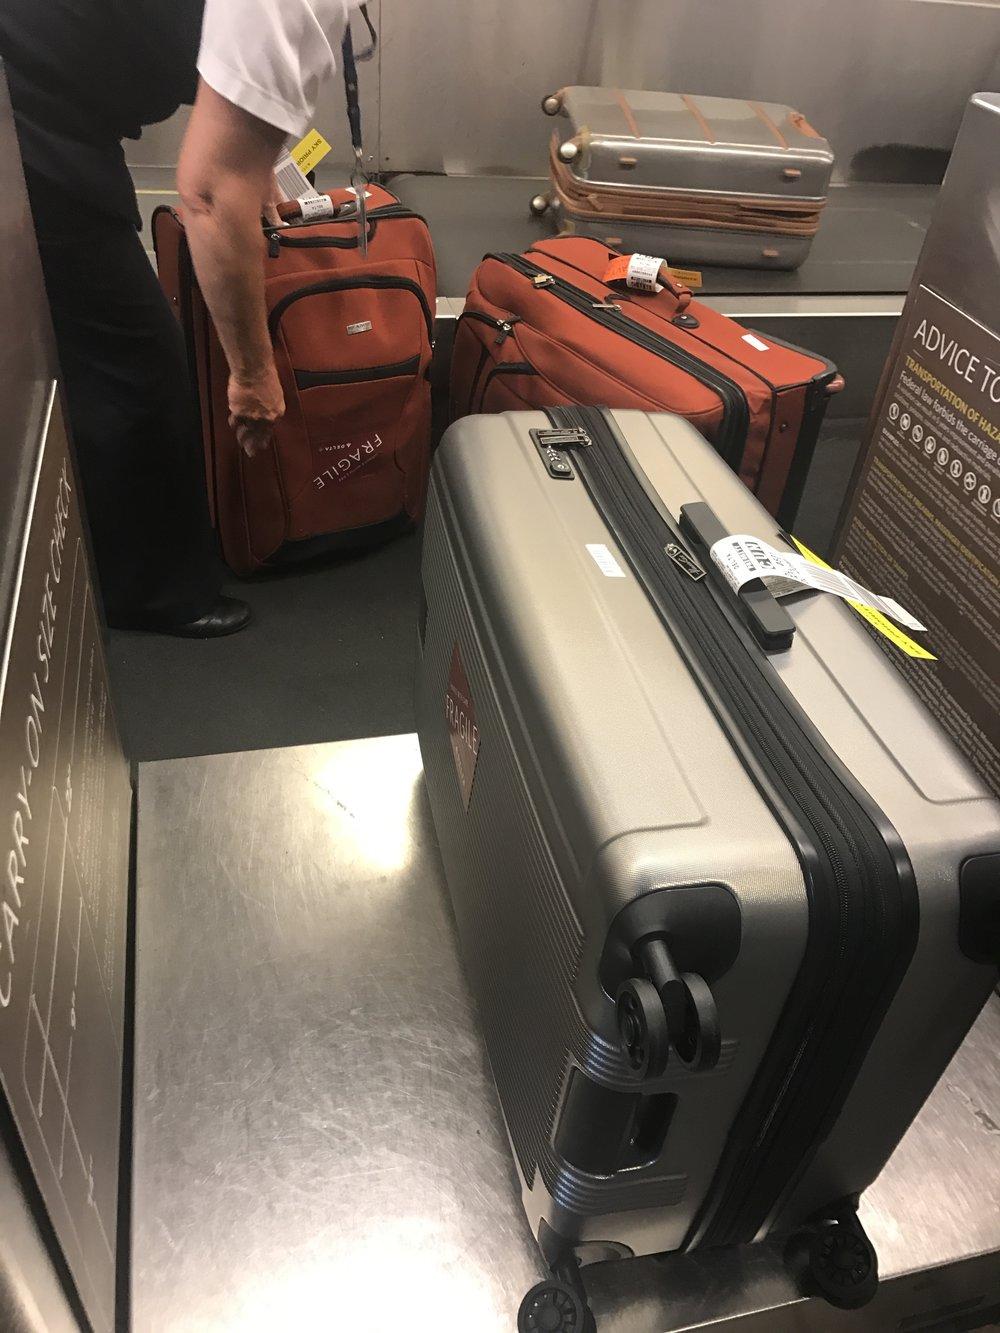 Black Destination Bride - BlackDesti Wedding Countdown Journal - Bridefriends Podcast -4 - Desti  Trip to Cancun Playa del Carmen Delta Mexico3.JPG